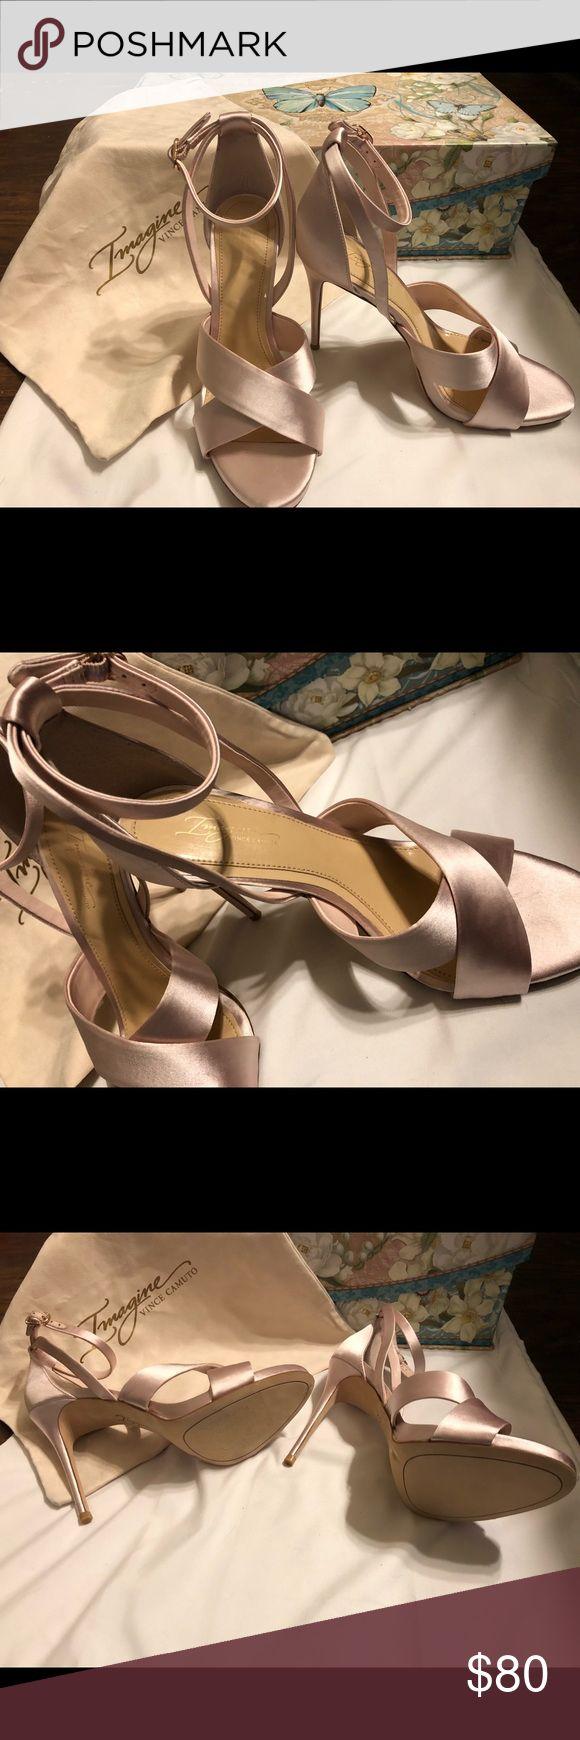 Vince Camuto Imagine light pink high heels Light pink high heels open toed! Brand new never worn Vince Camuto Shoes Heels